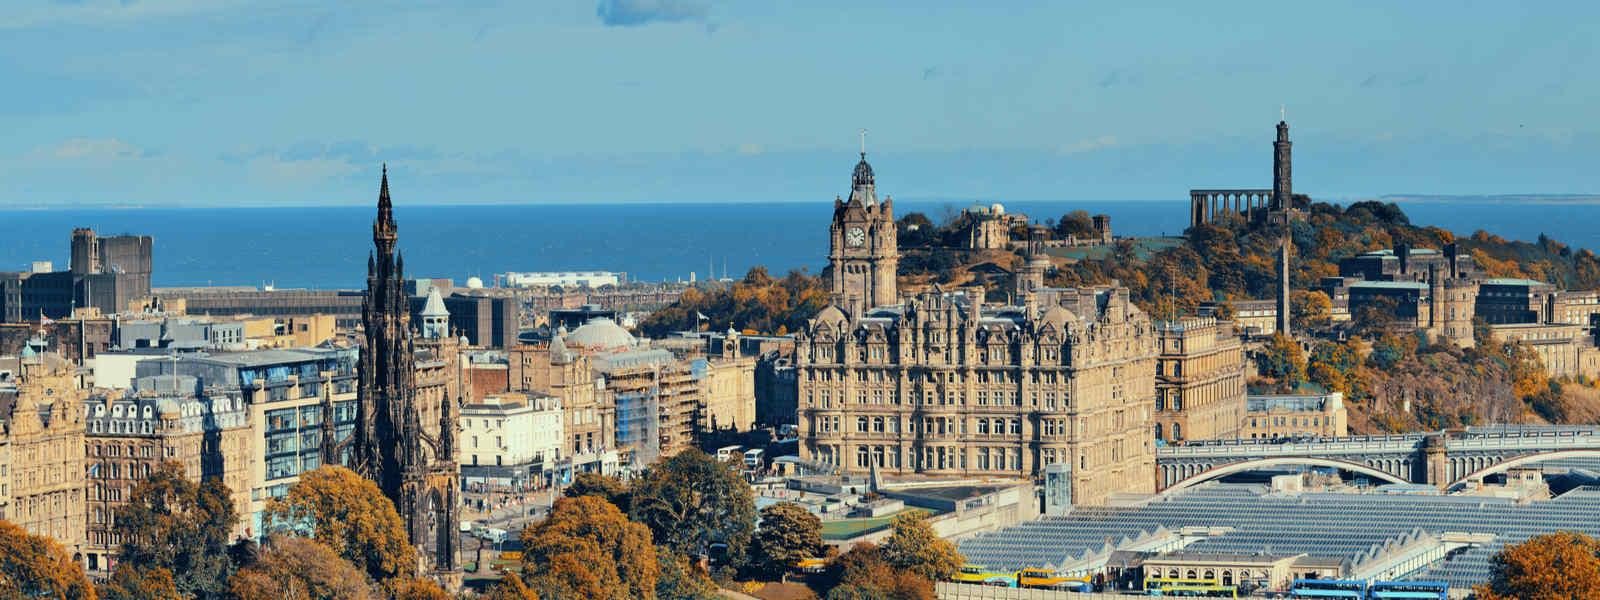 Panoramic view of Edinburgh from Arthur's Seat